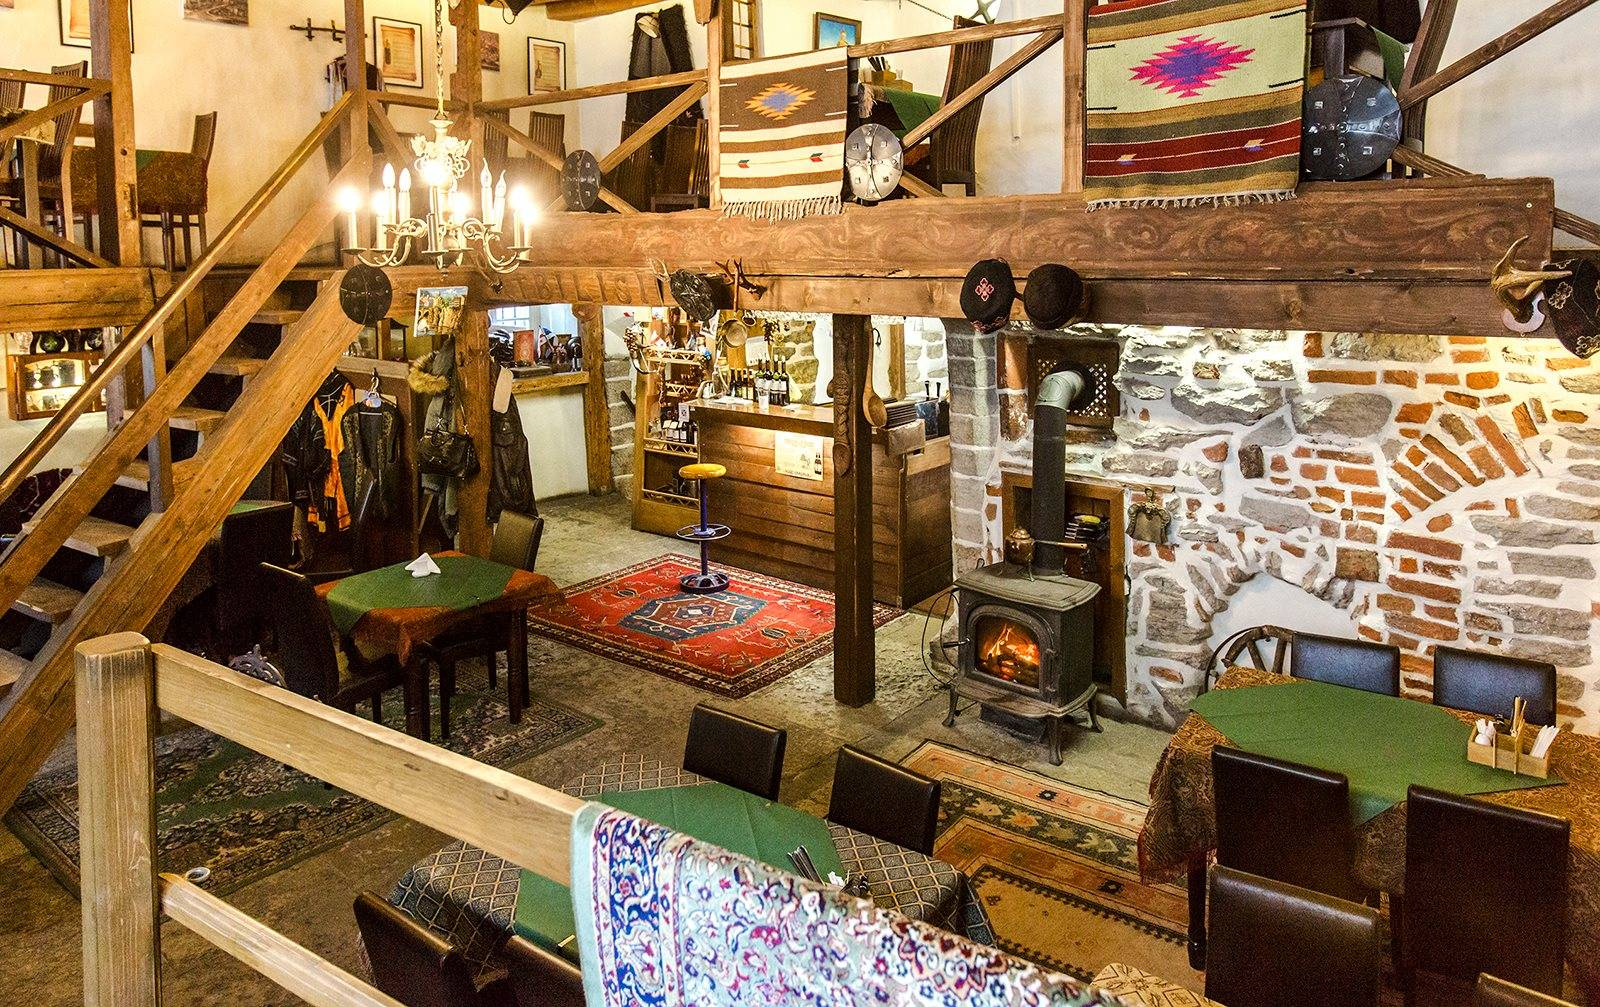 Interior of the Georgian Tavern Tbilisi in the Old Town of Tallinn, Estonia